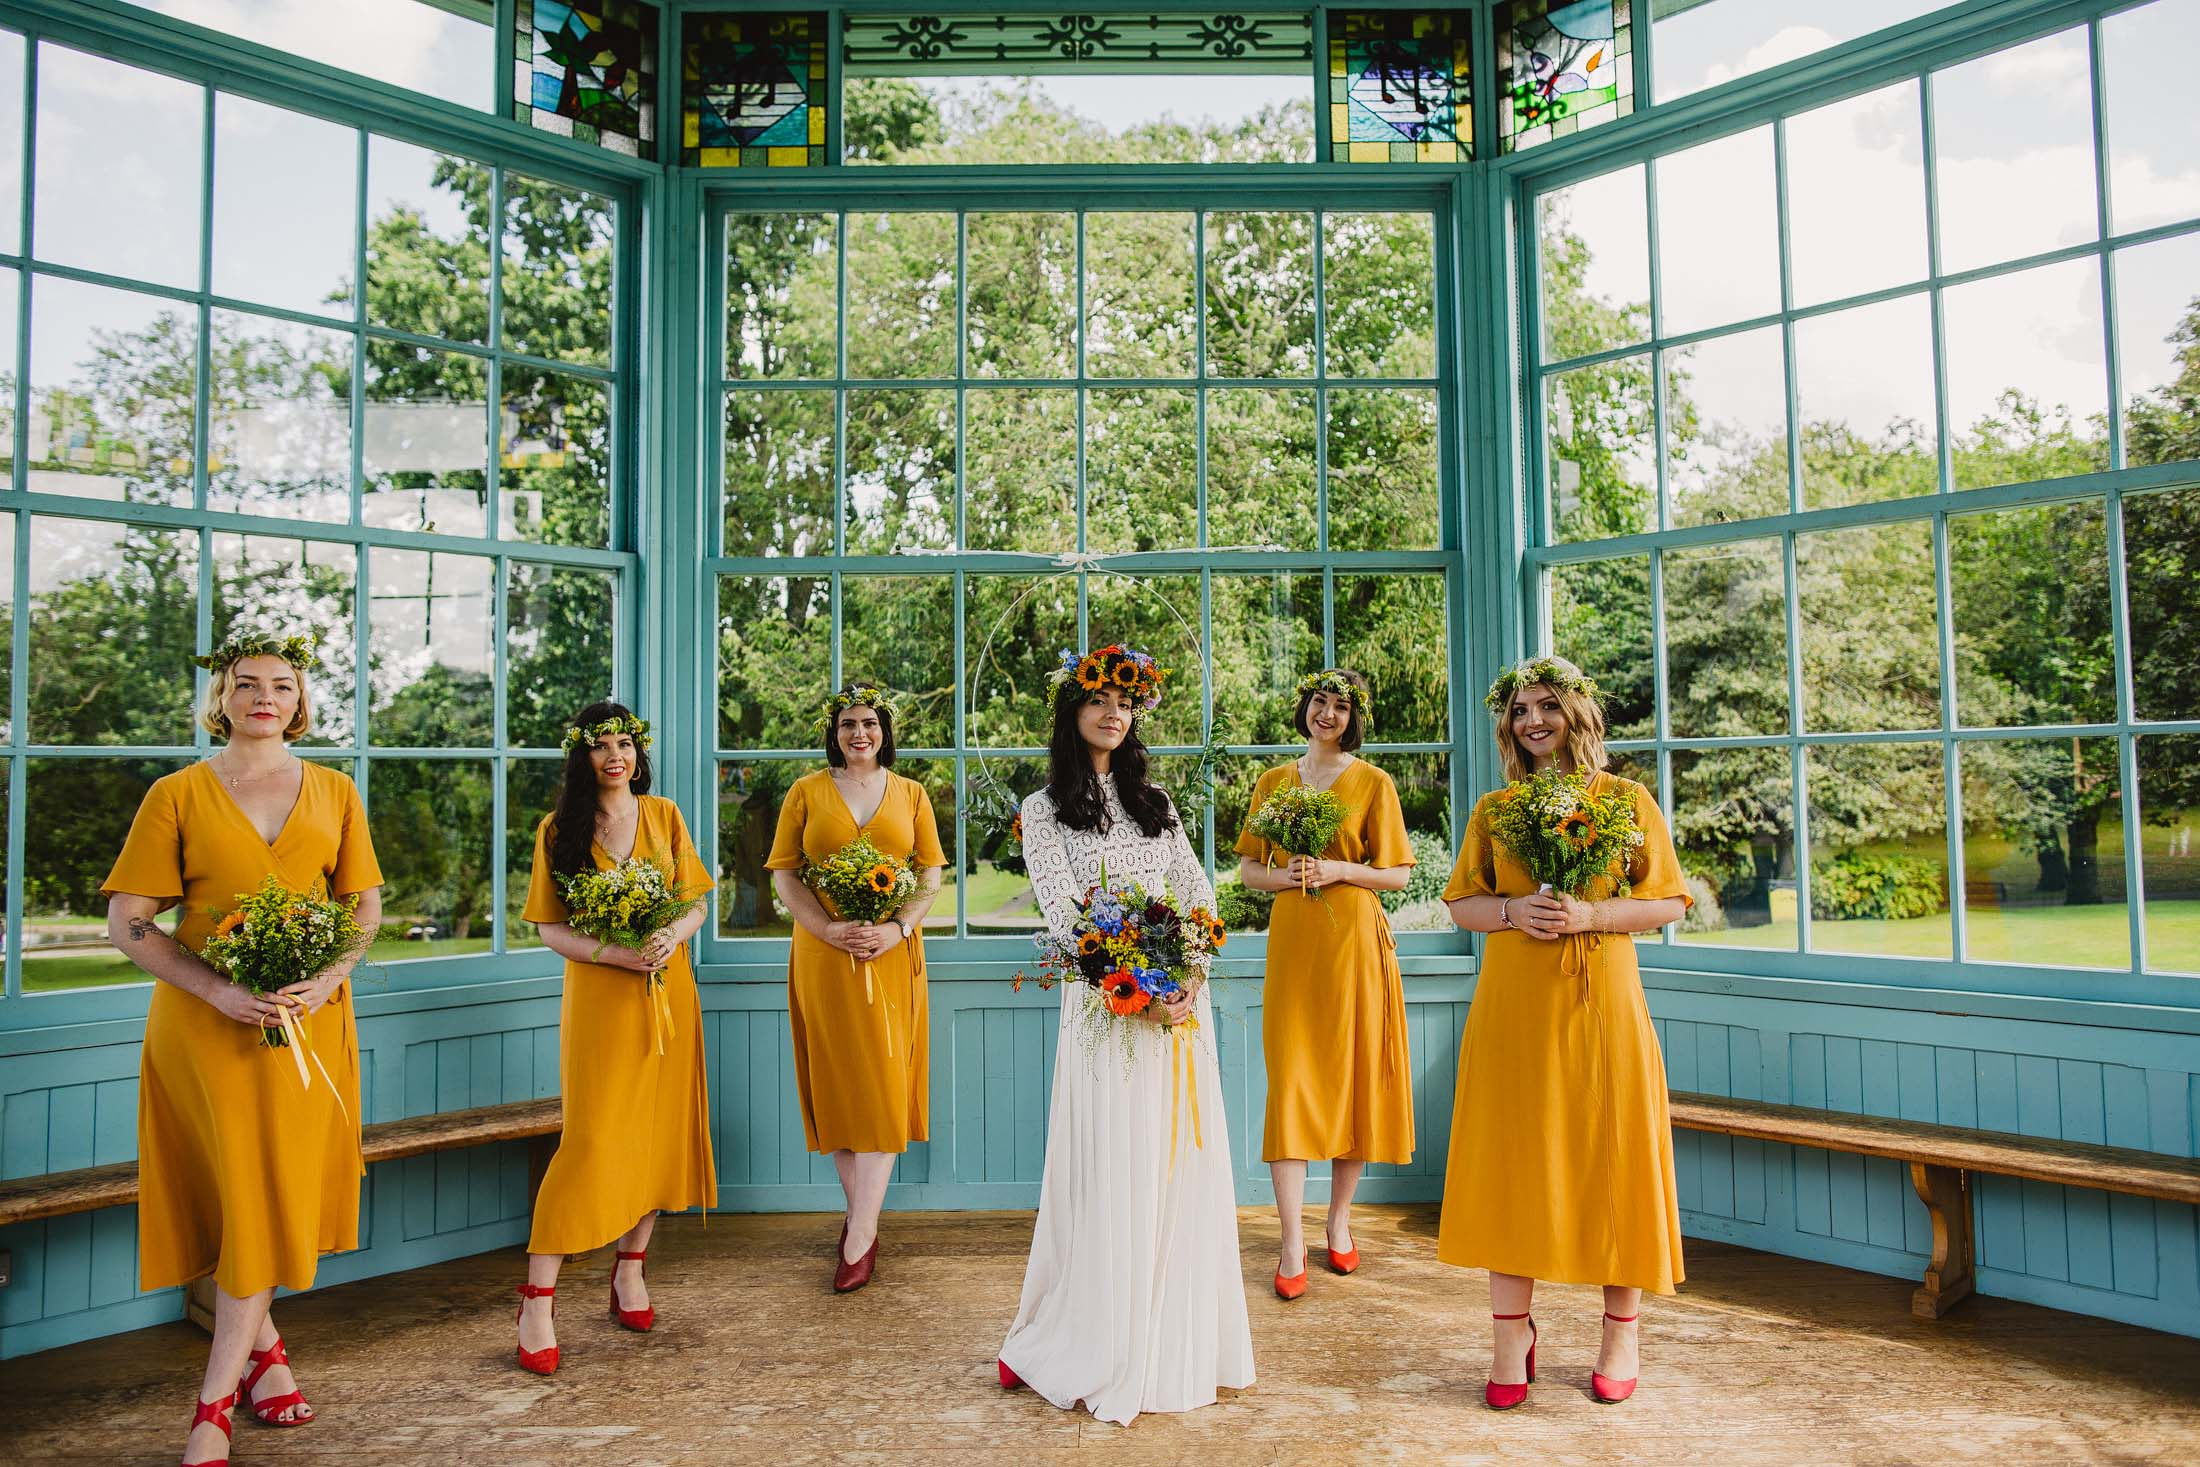 Sheffield bandstand wedding